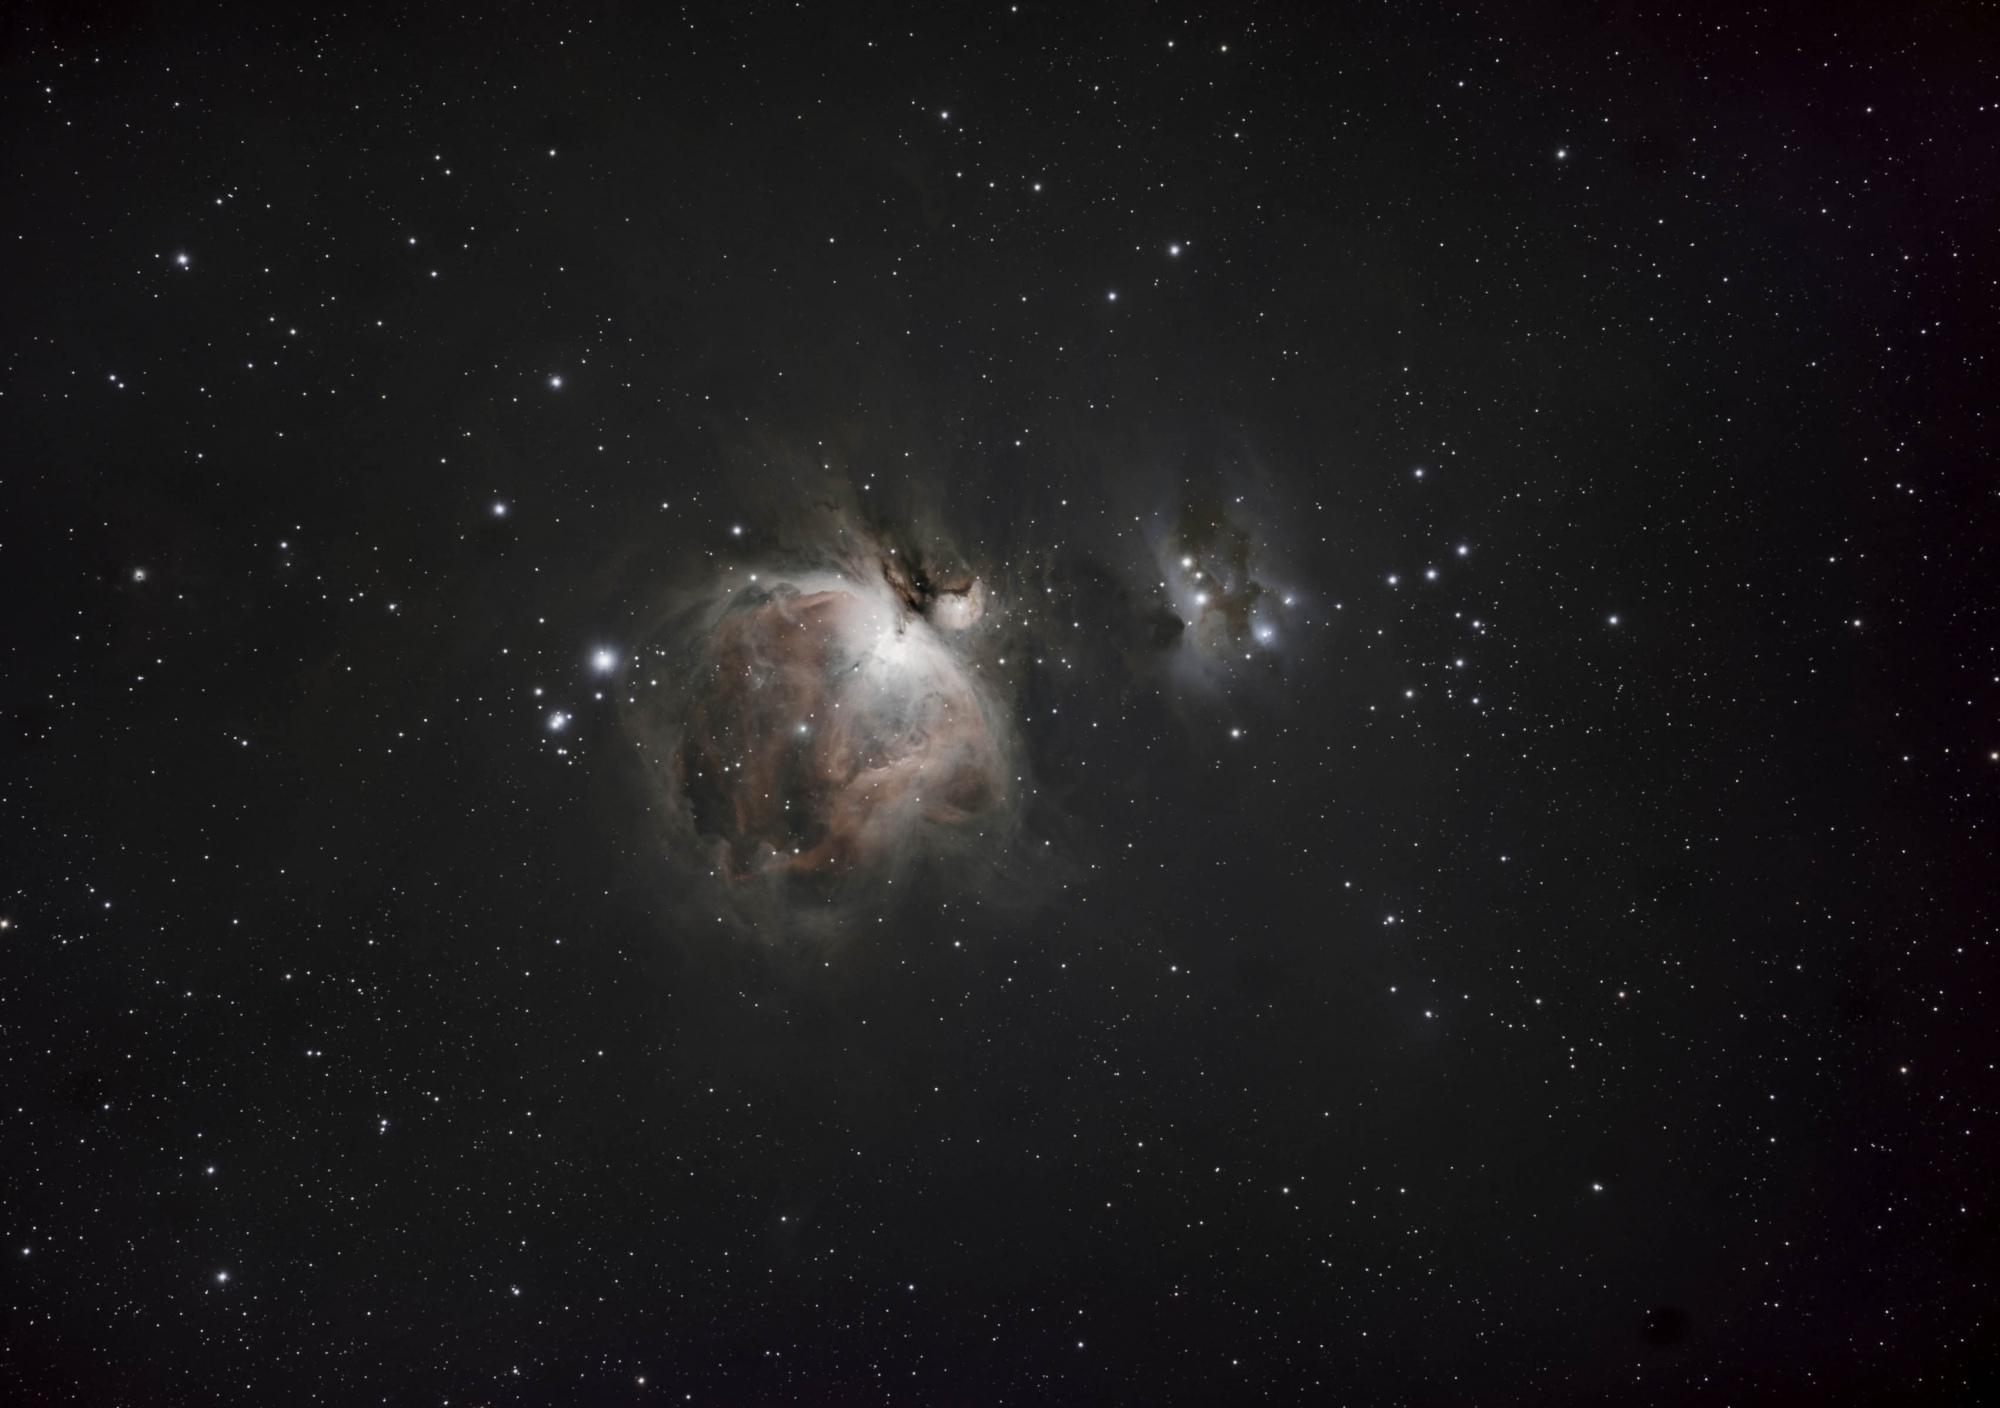 M42CLS.thumb.jpg.34d196969de9da76e17534e8a26b4c9d.jpg